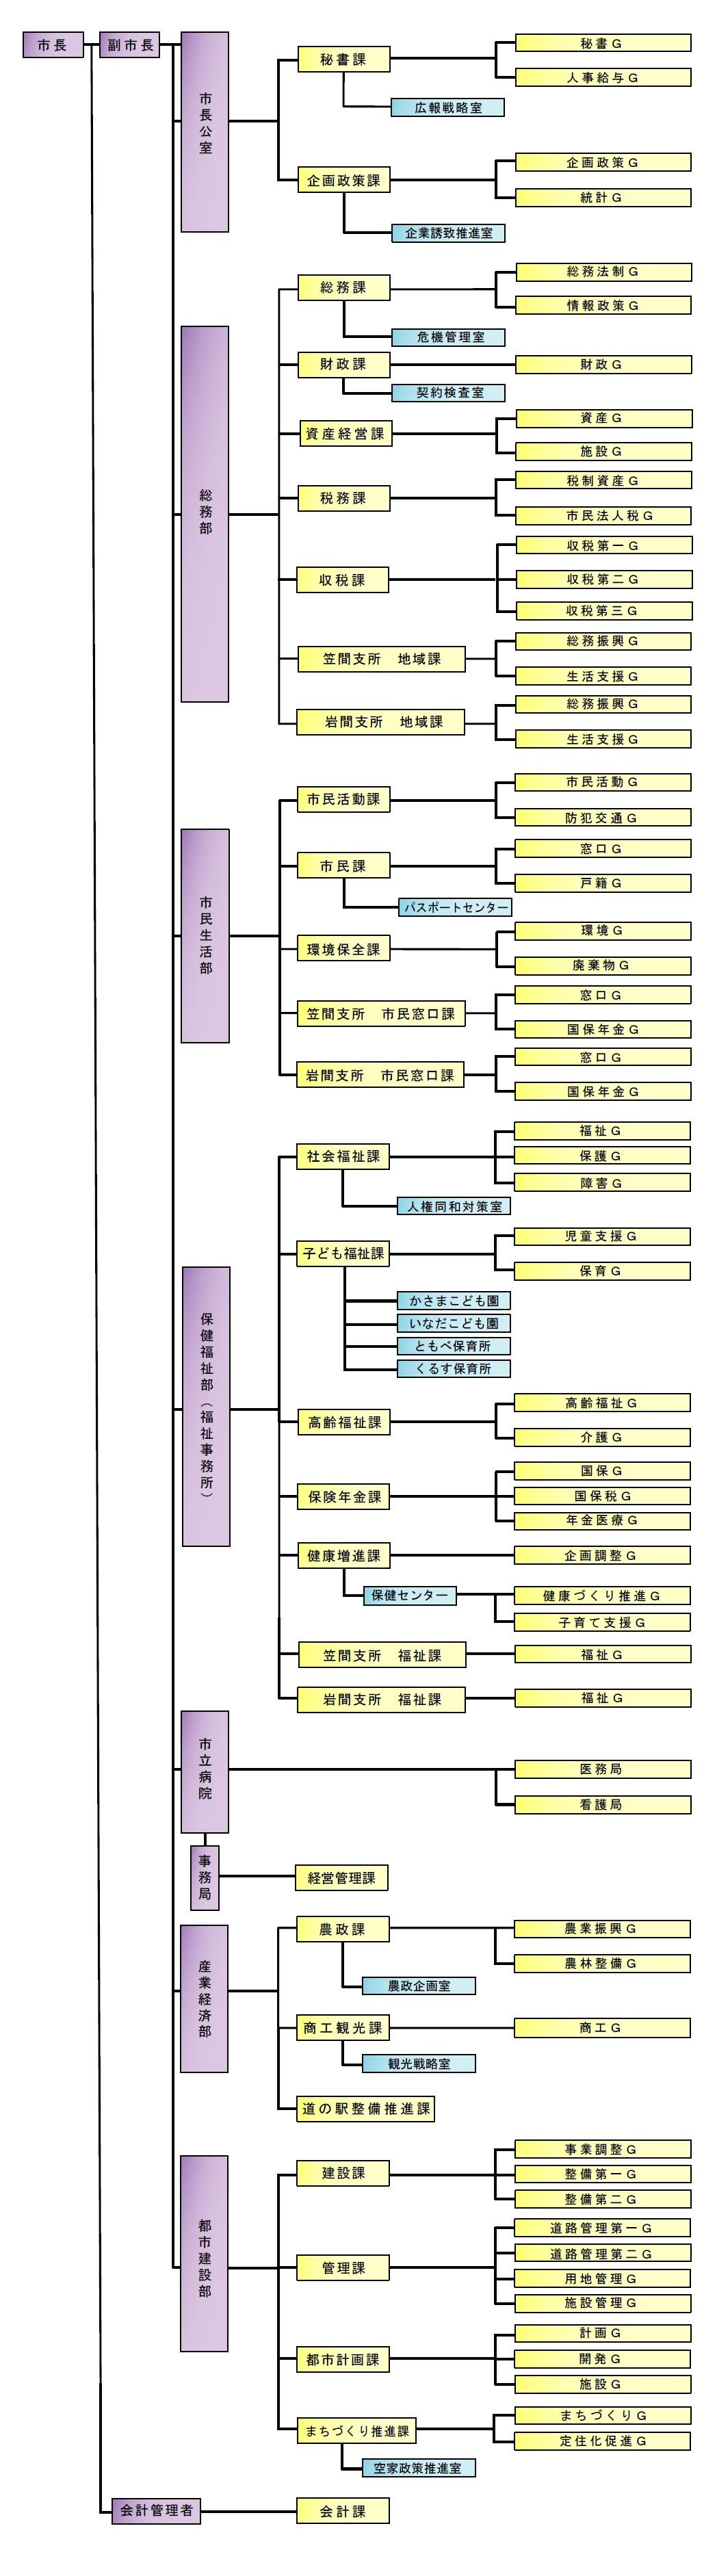 『『H30年度組織図(本庁)』の画像』の画像